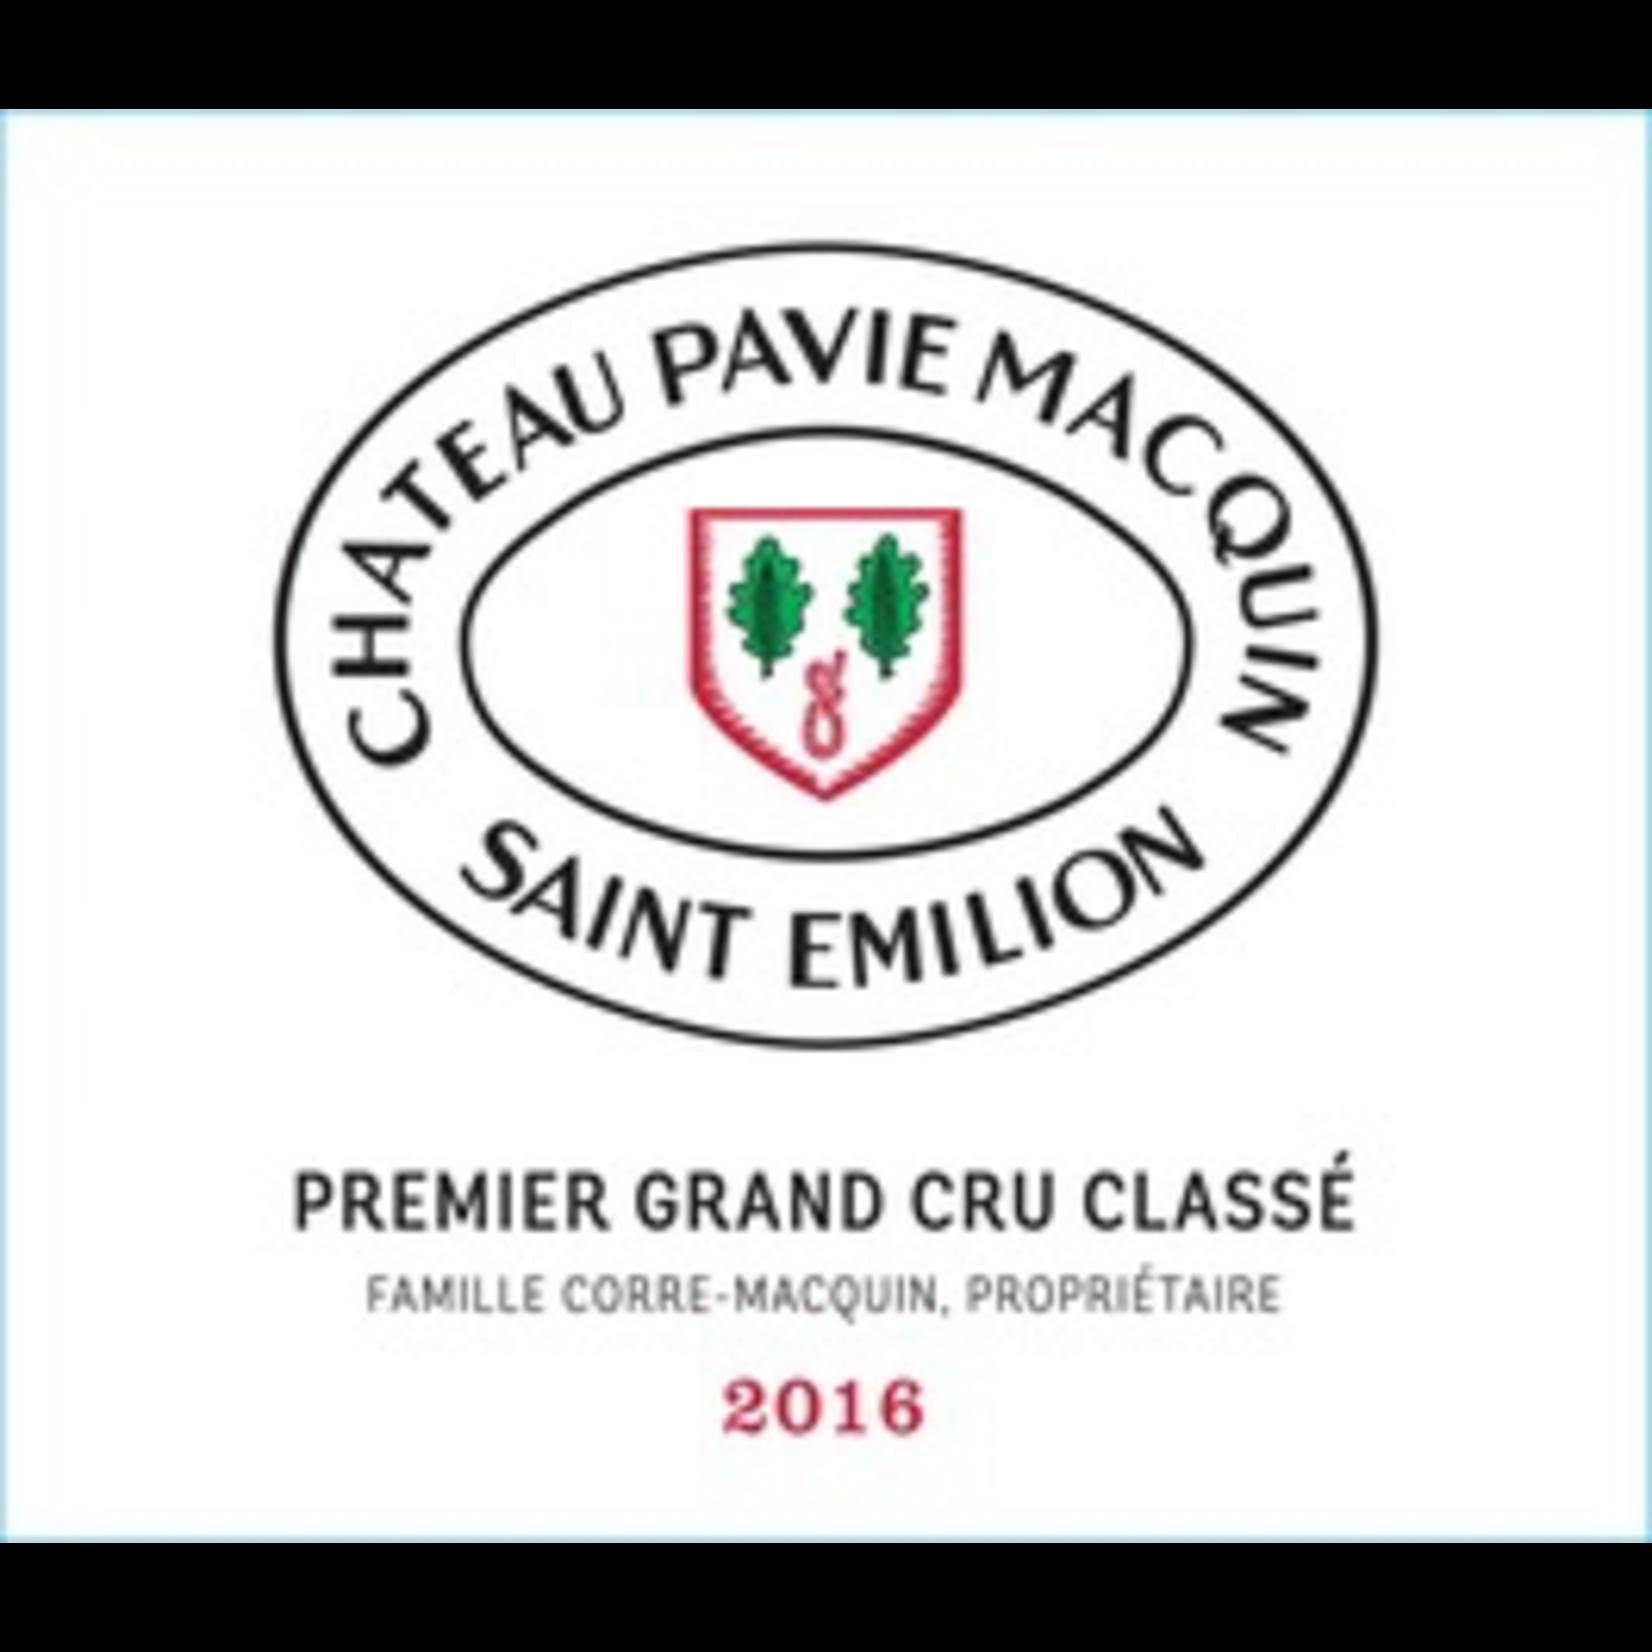 Wine Chateau Pavie Macquin 2018